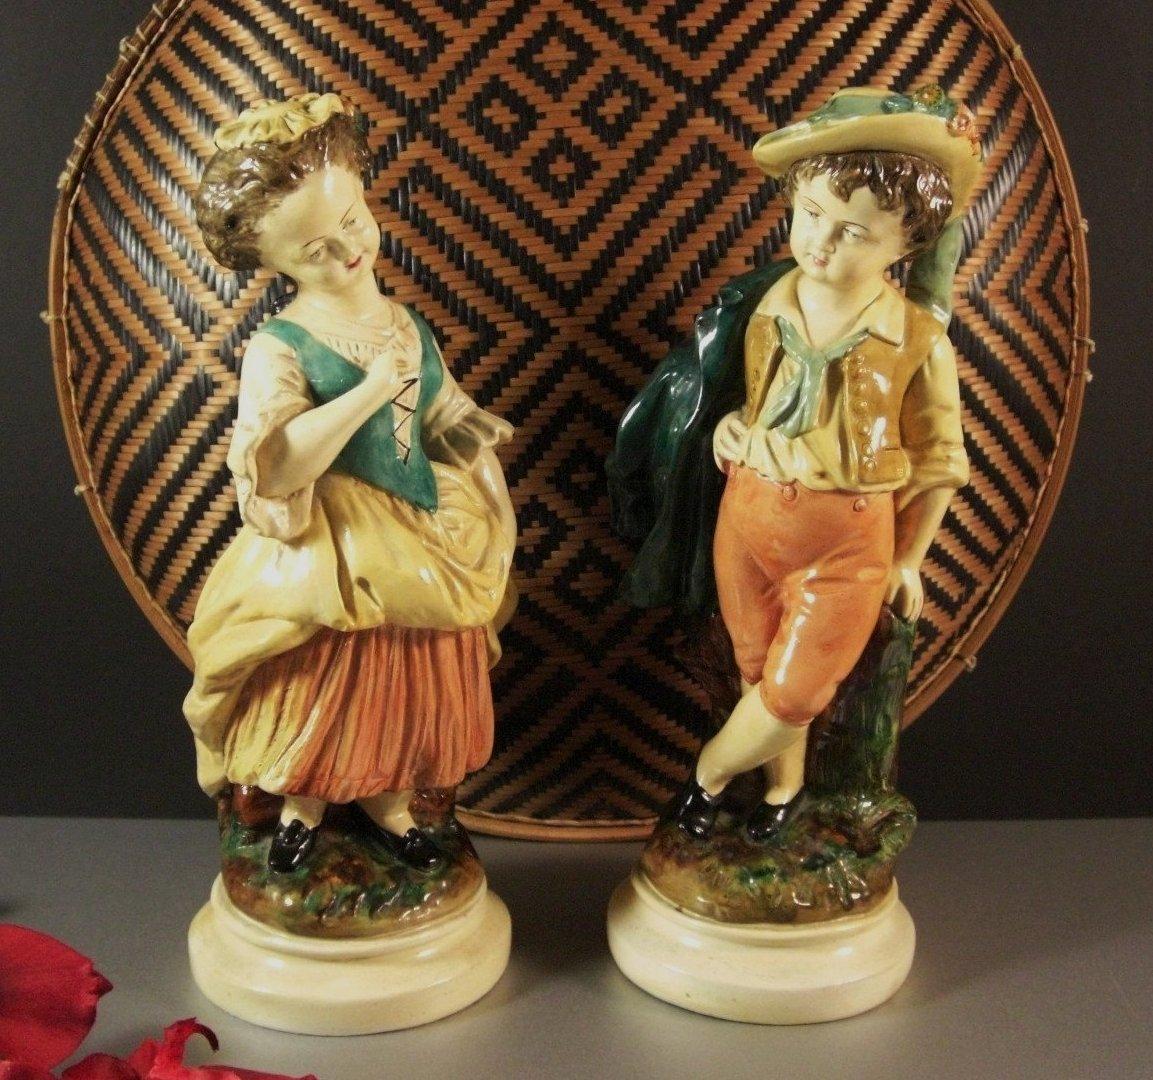 Borghese Chalkware Boy and Girl Figurine Statues / Mantel Decor